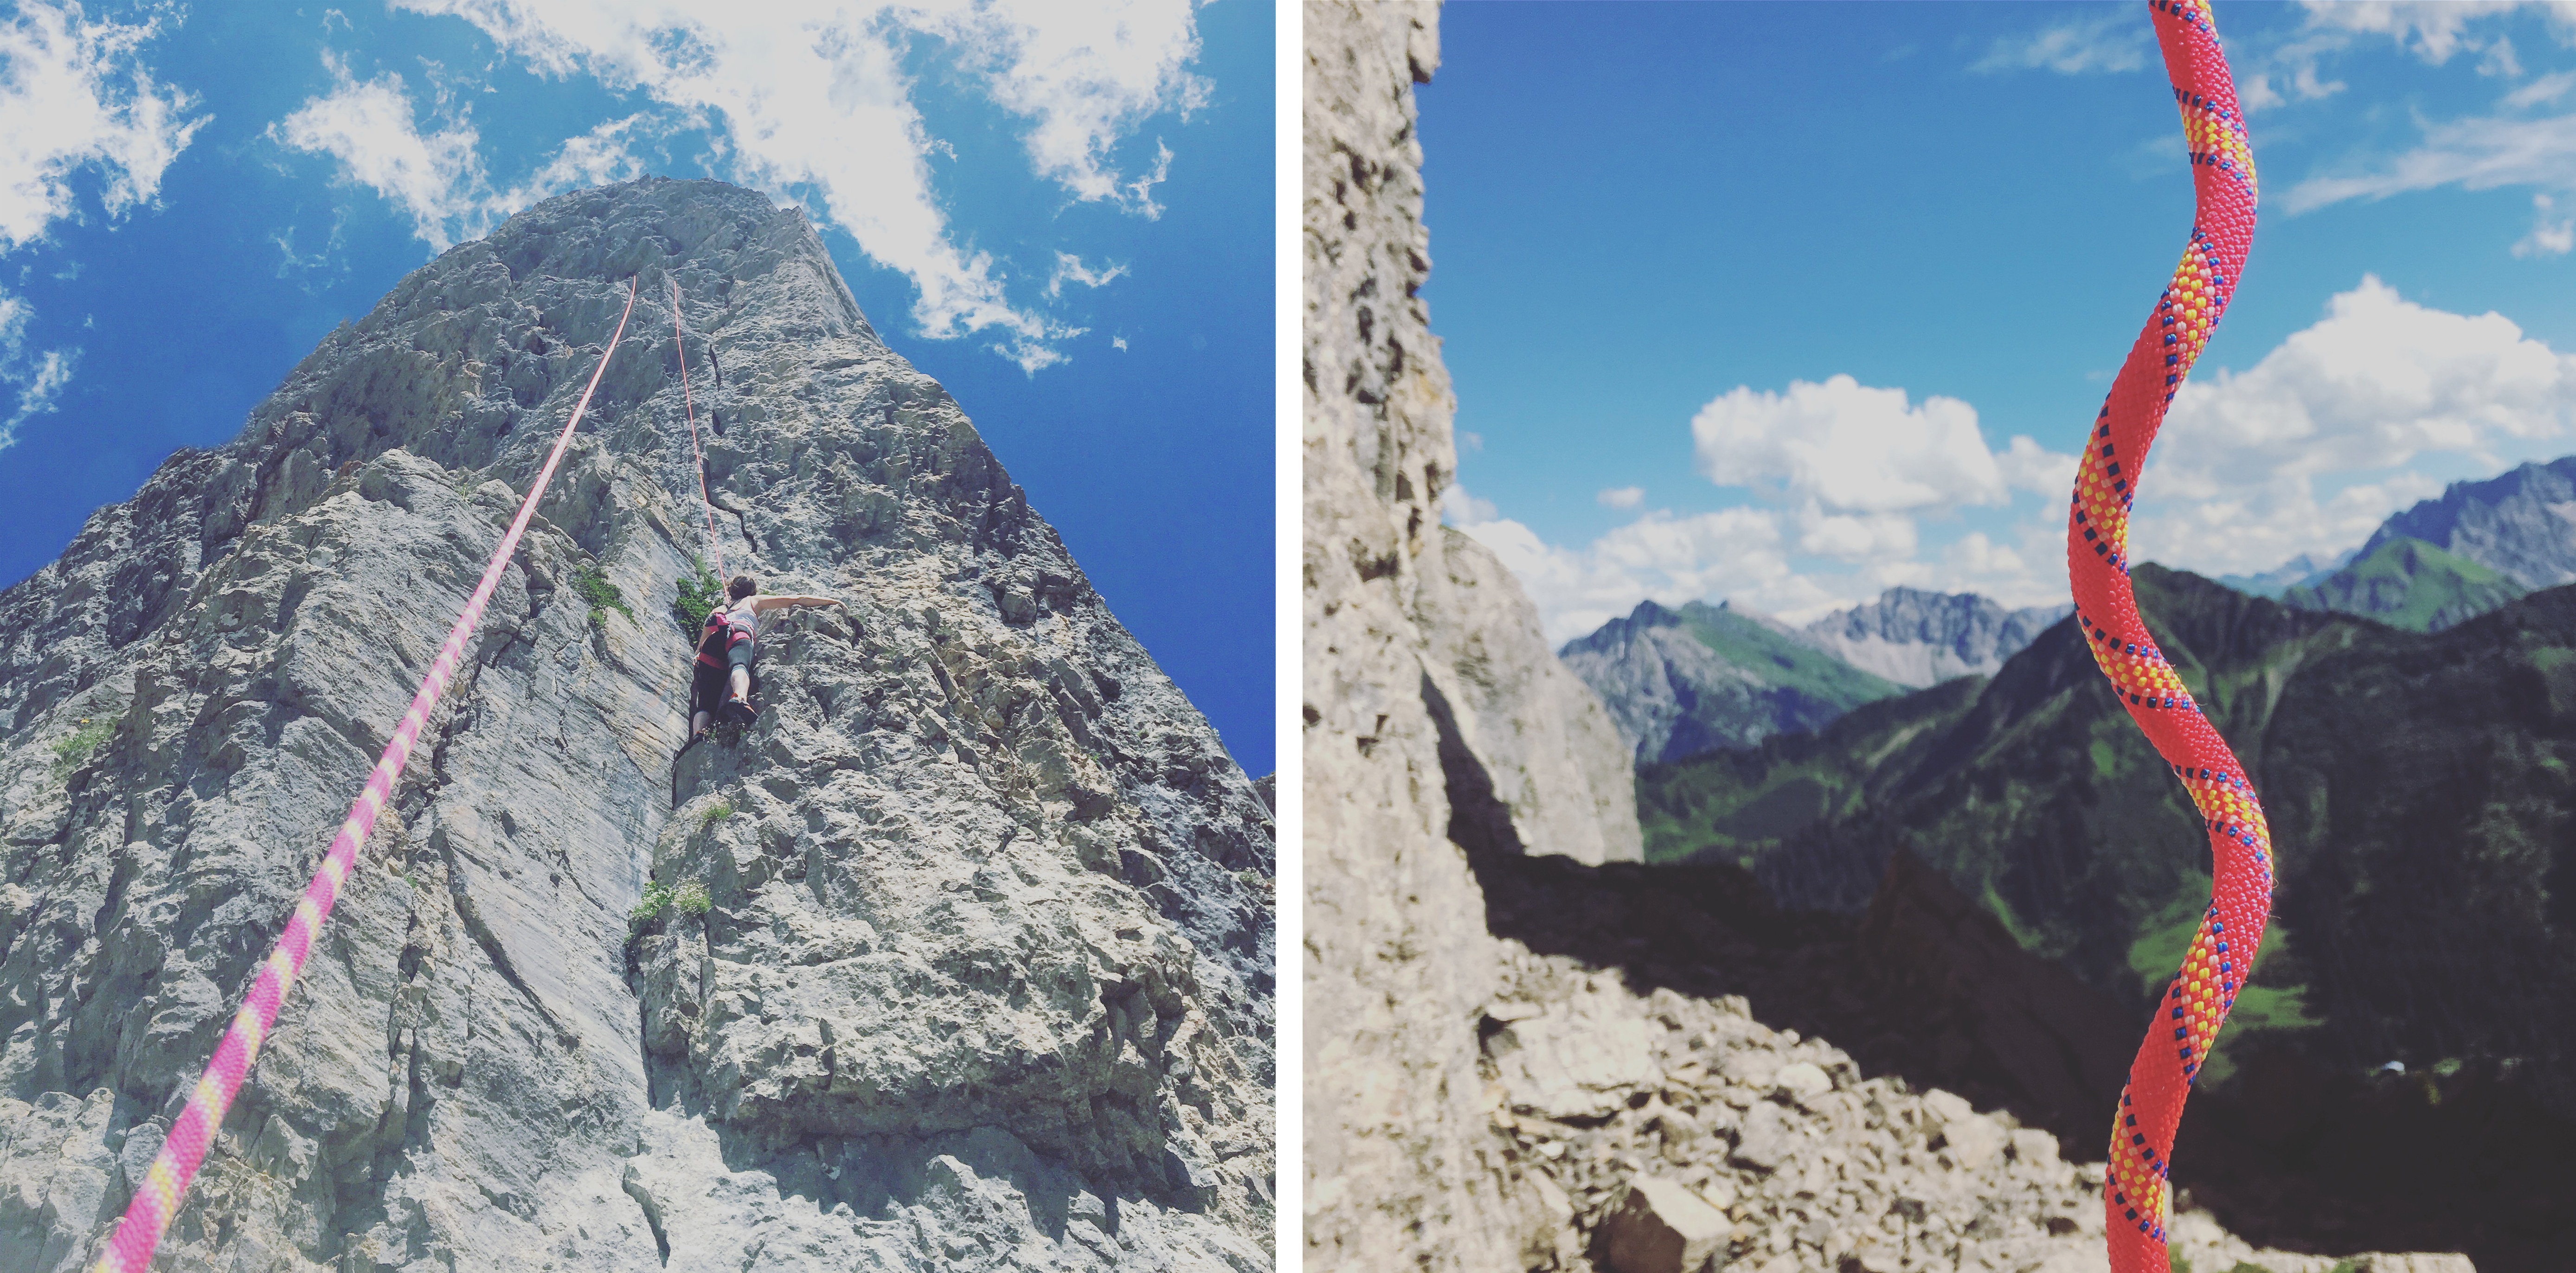 maybeyoulike_climbing_kleinwalsertal6